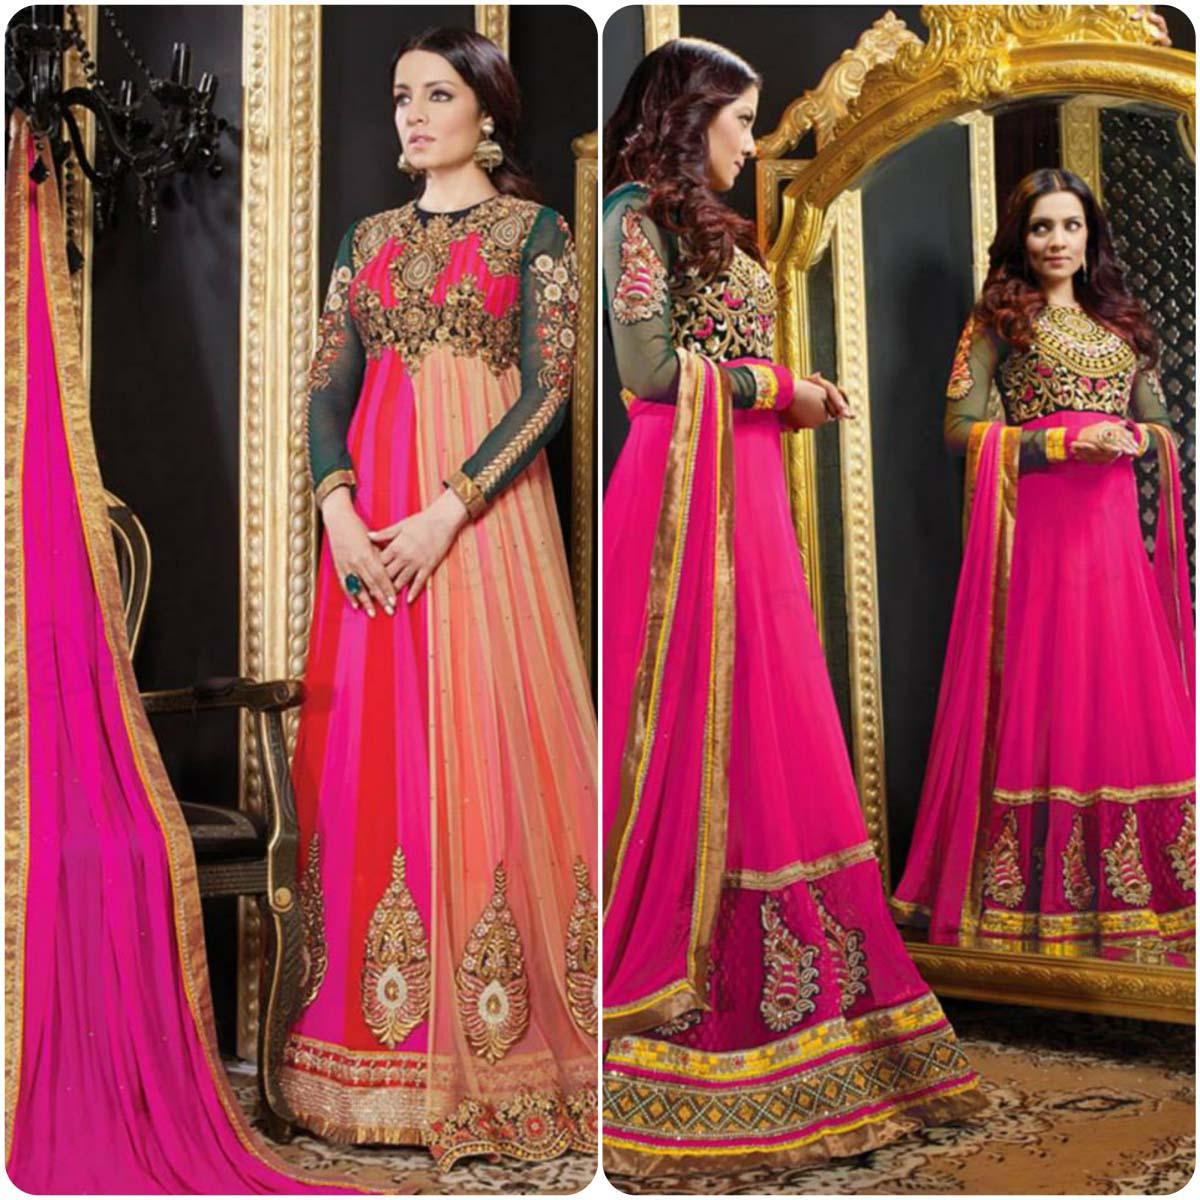 Natasha Couture Latest Indian Anarkali Dress Desigs Collection 2016-2017...styloplanet (4)